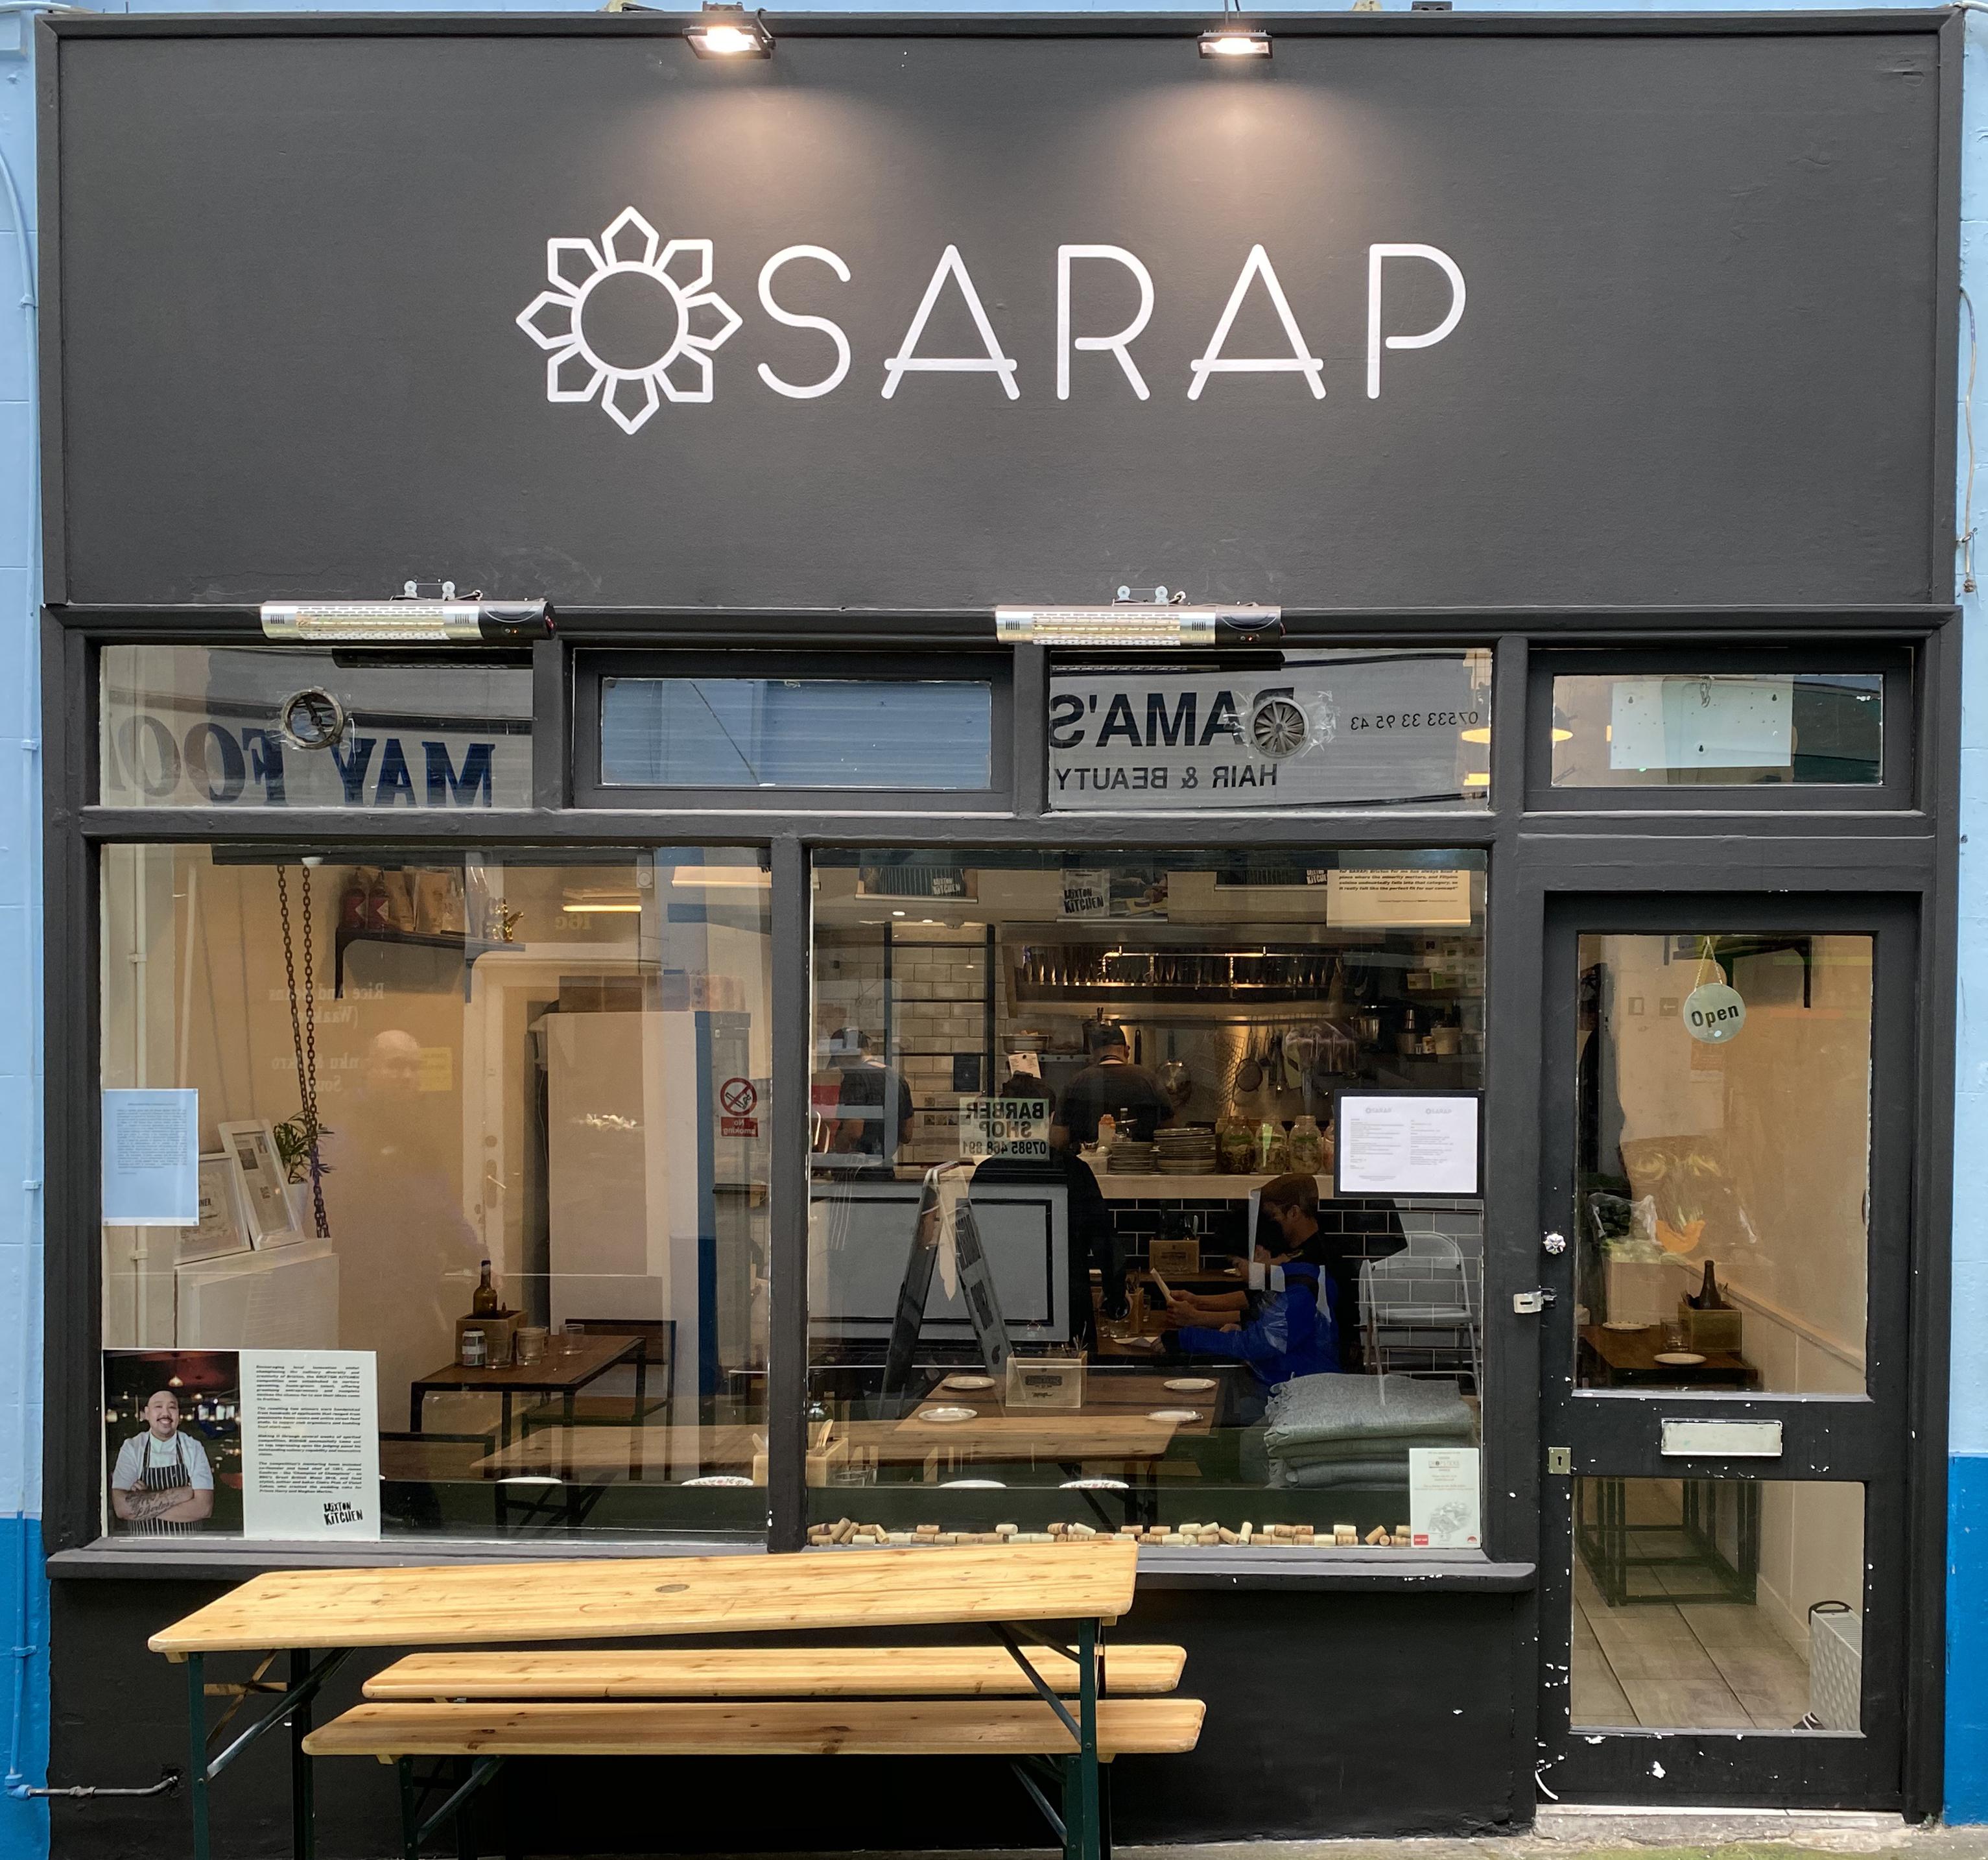 sarap01 - Copy